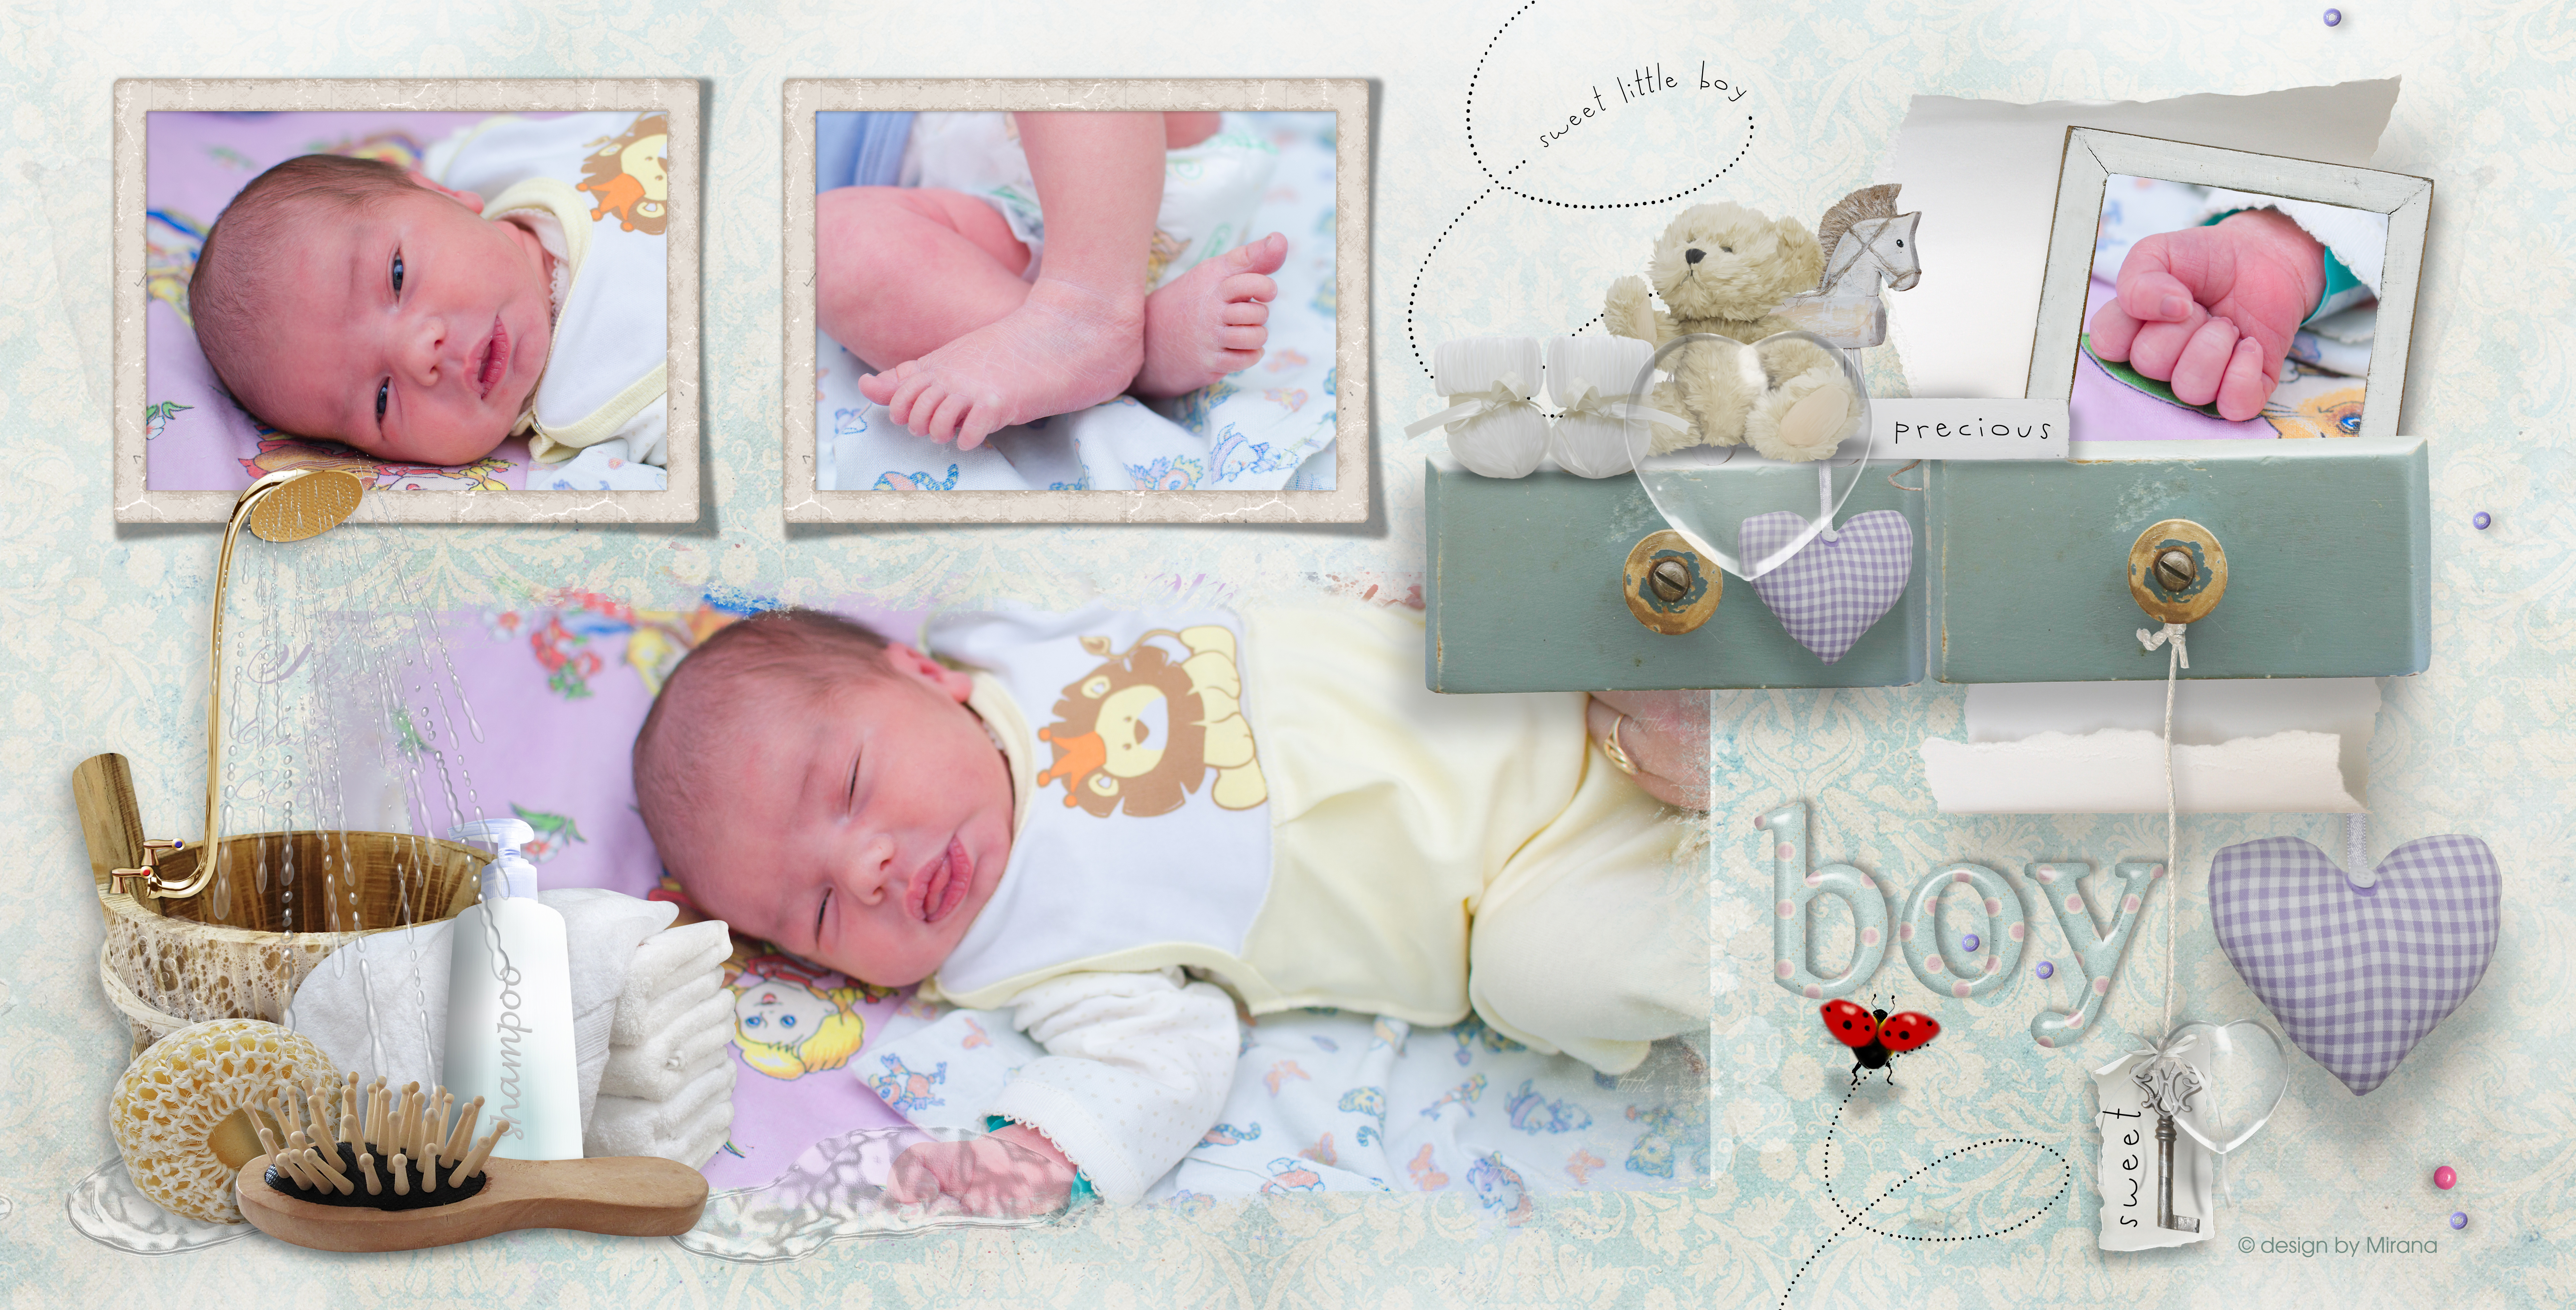 PB_Sweet Boy_by Mirana 4